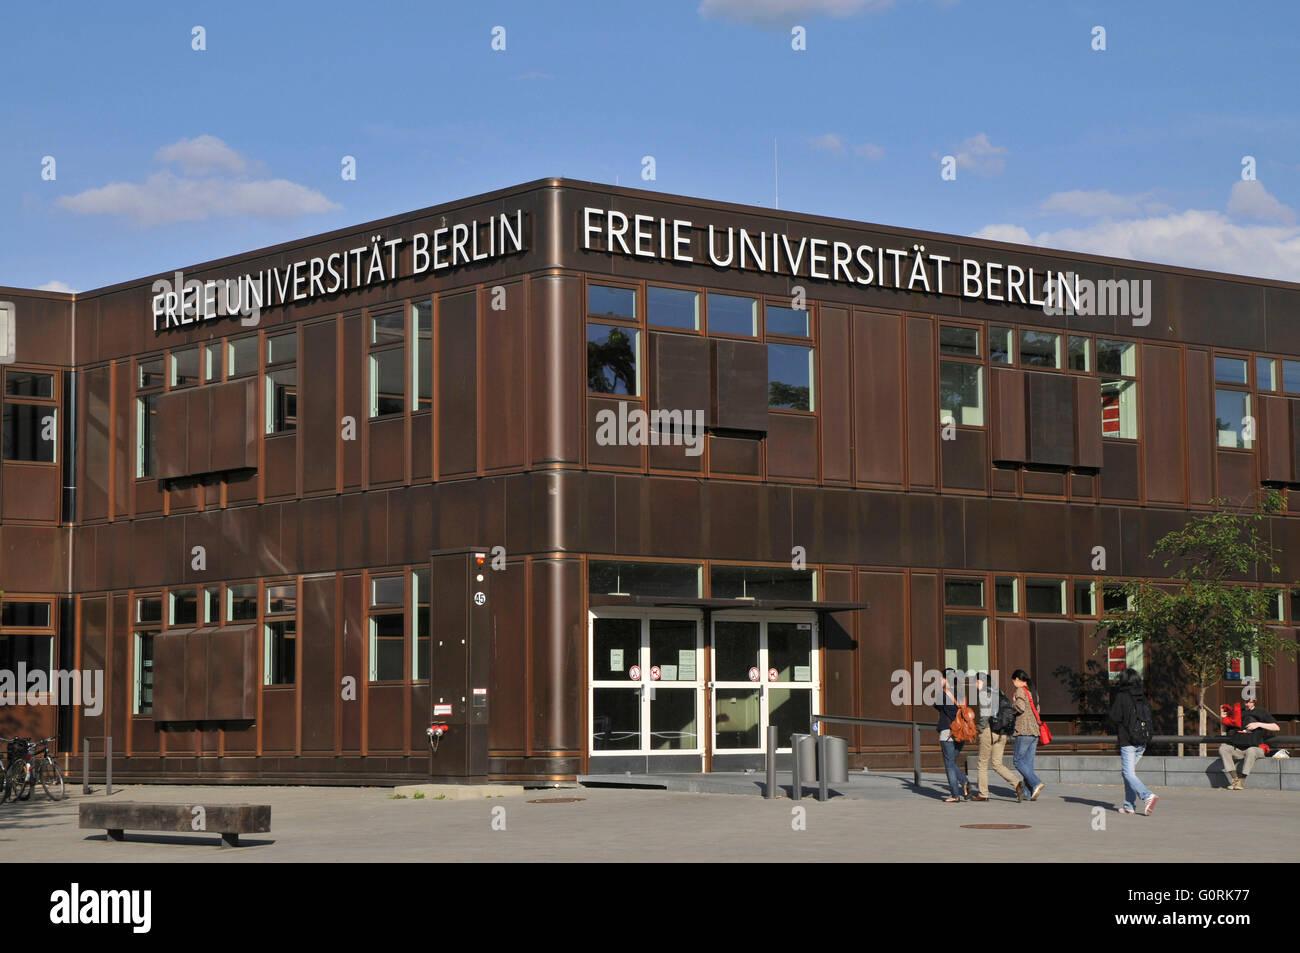 freie universität berlin university Teaching as an associate professor of modern german literature at the university of tokyo (since 2012), i regularly offer four courses per semester in the german department at hongo campus.